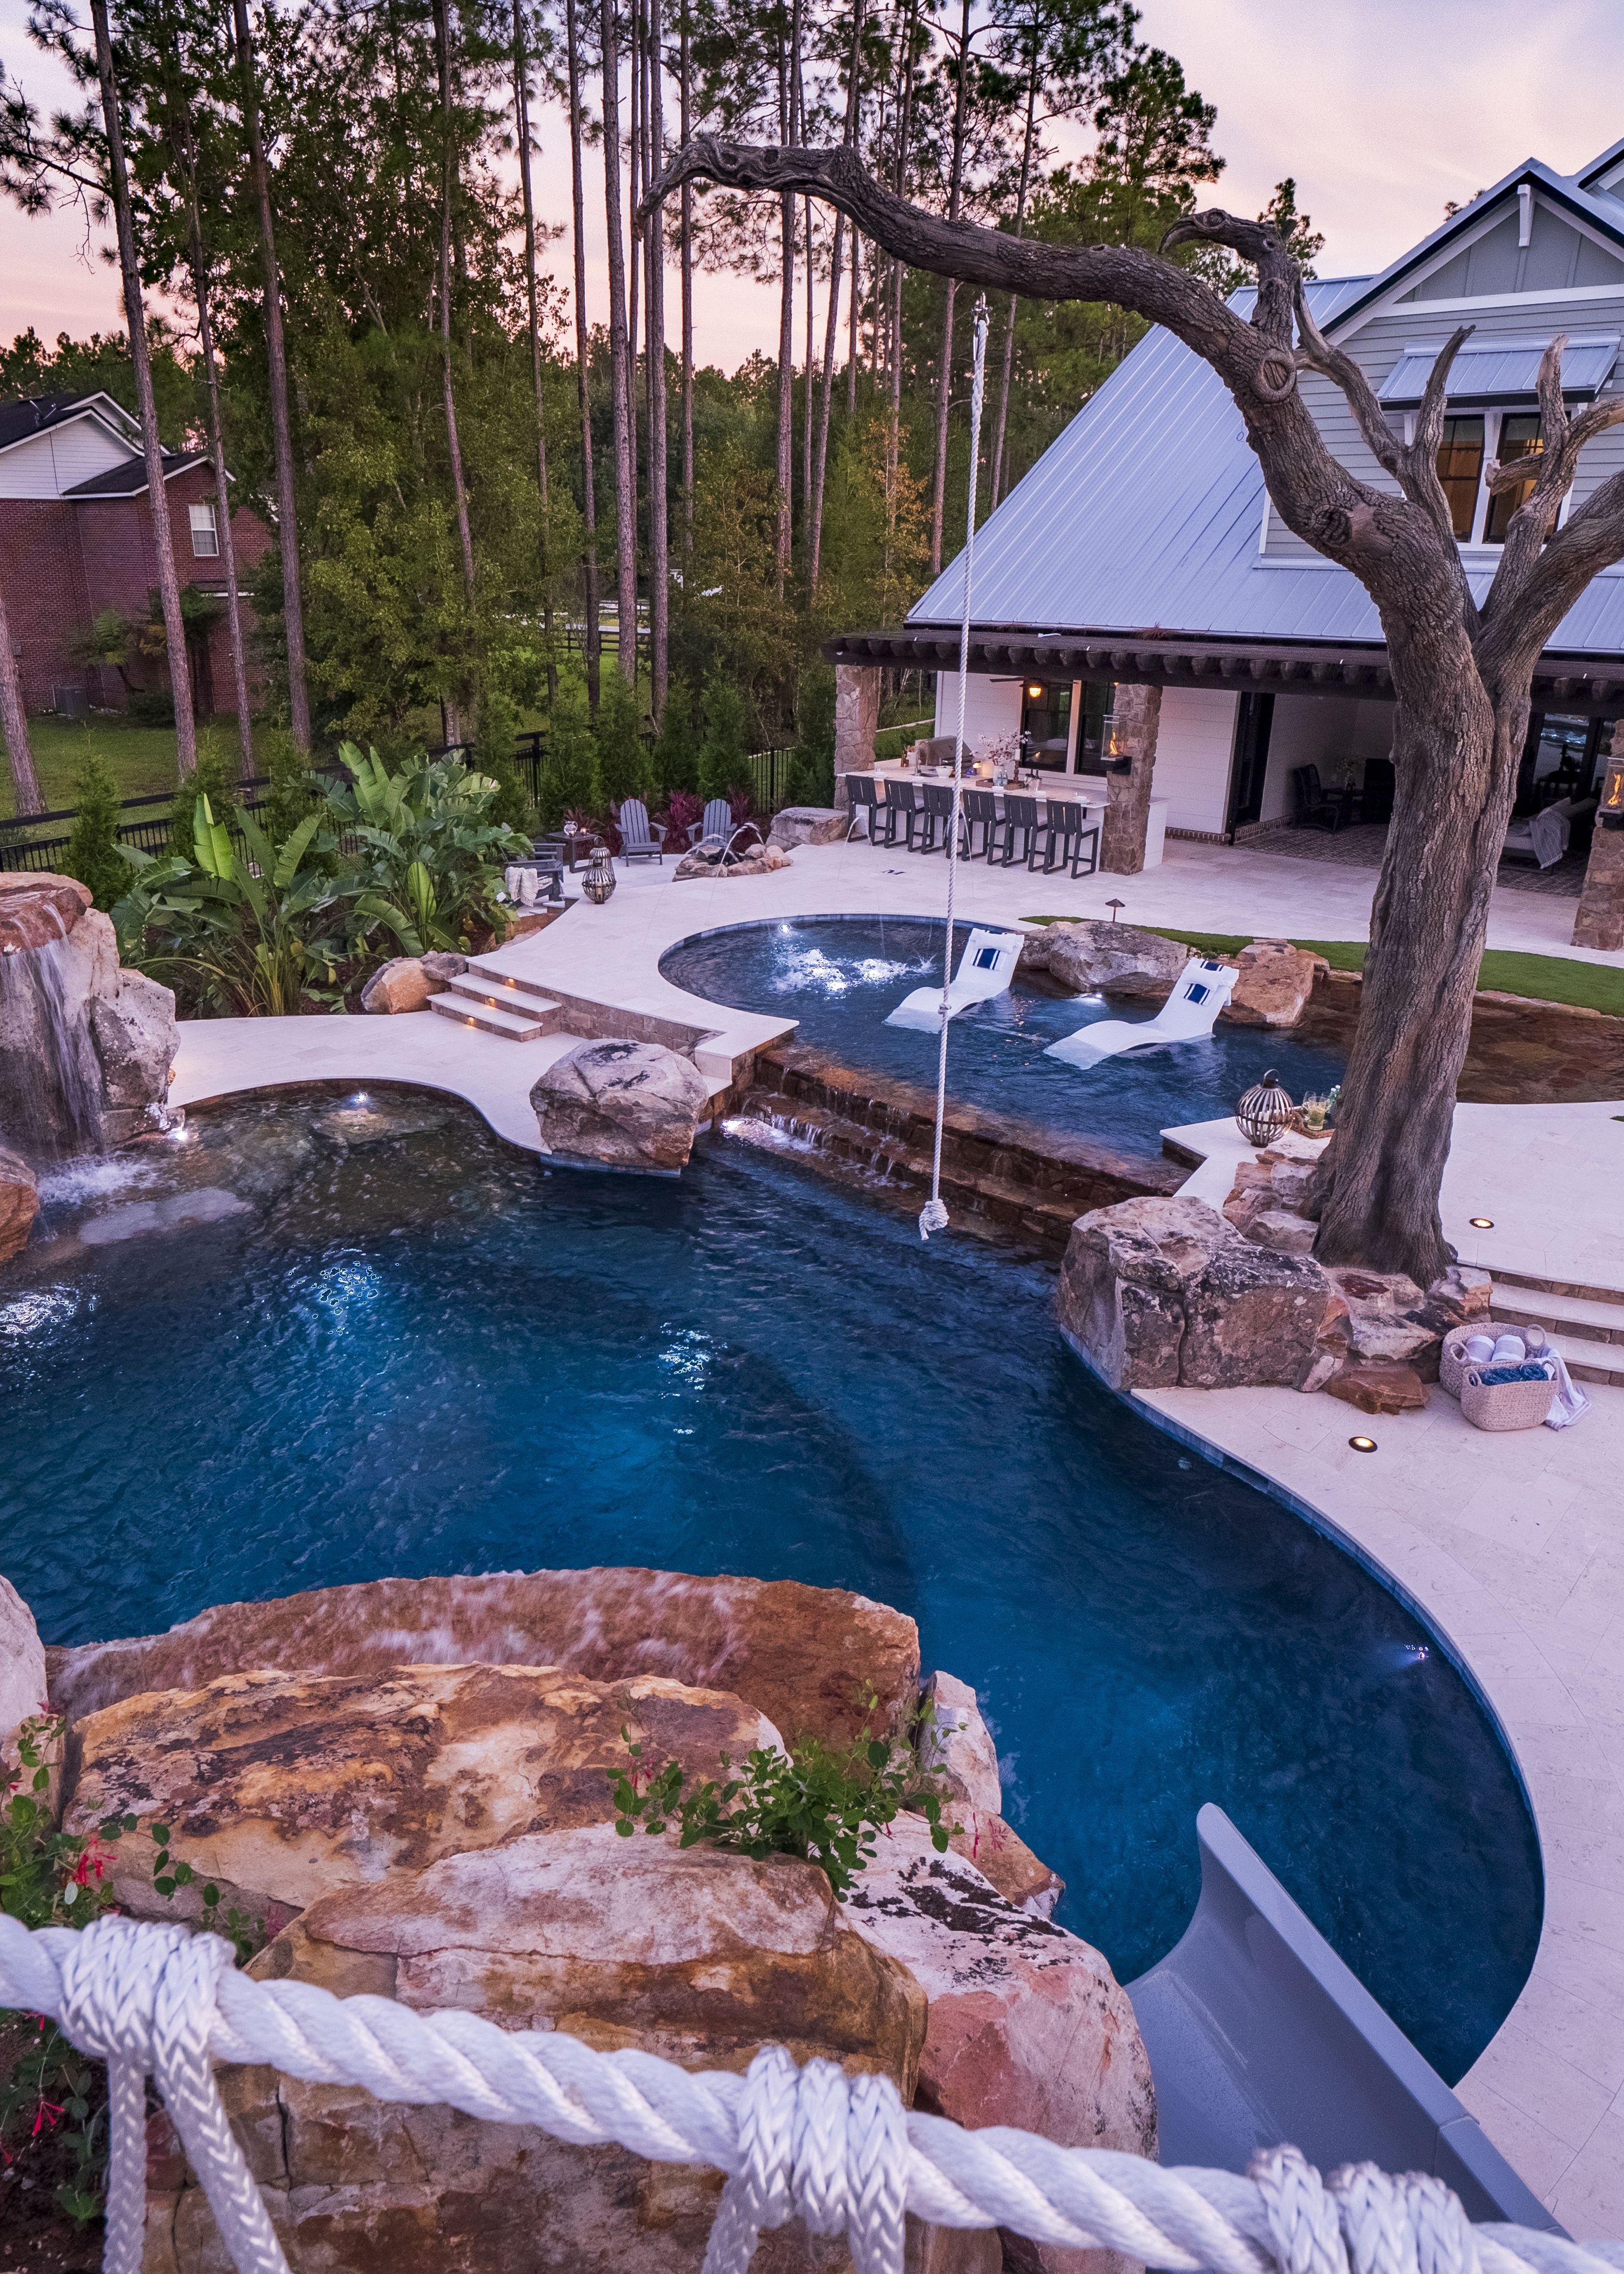 10 Dreamy Pools To Inspire Your Next Backyard Renovation Pratt Guys Dream Patio Pools Backyard Inground Backyard Renovations